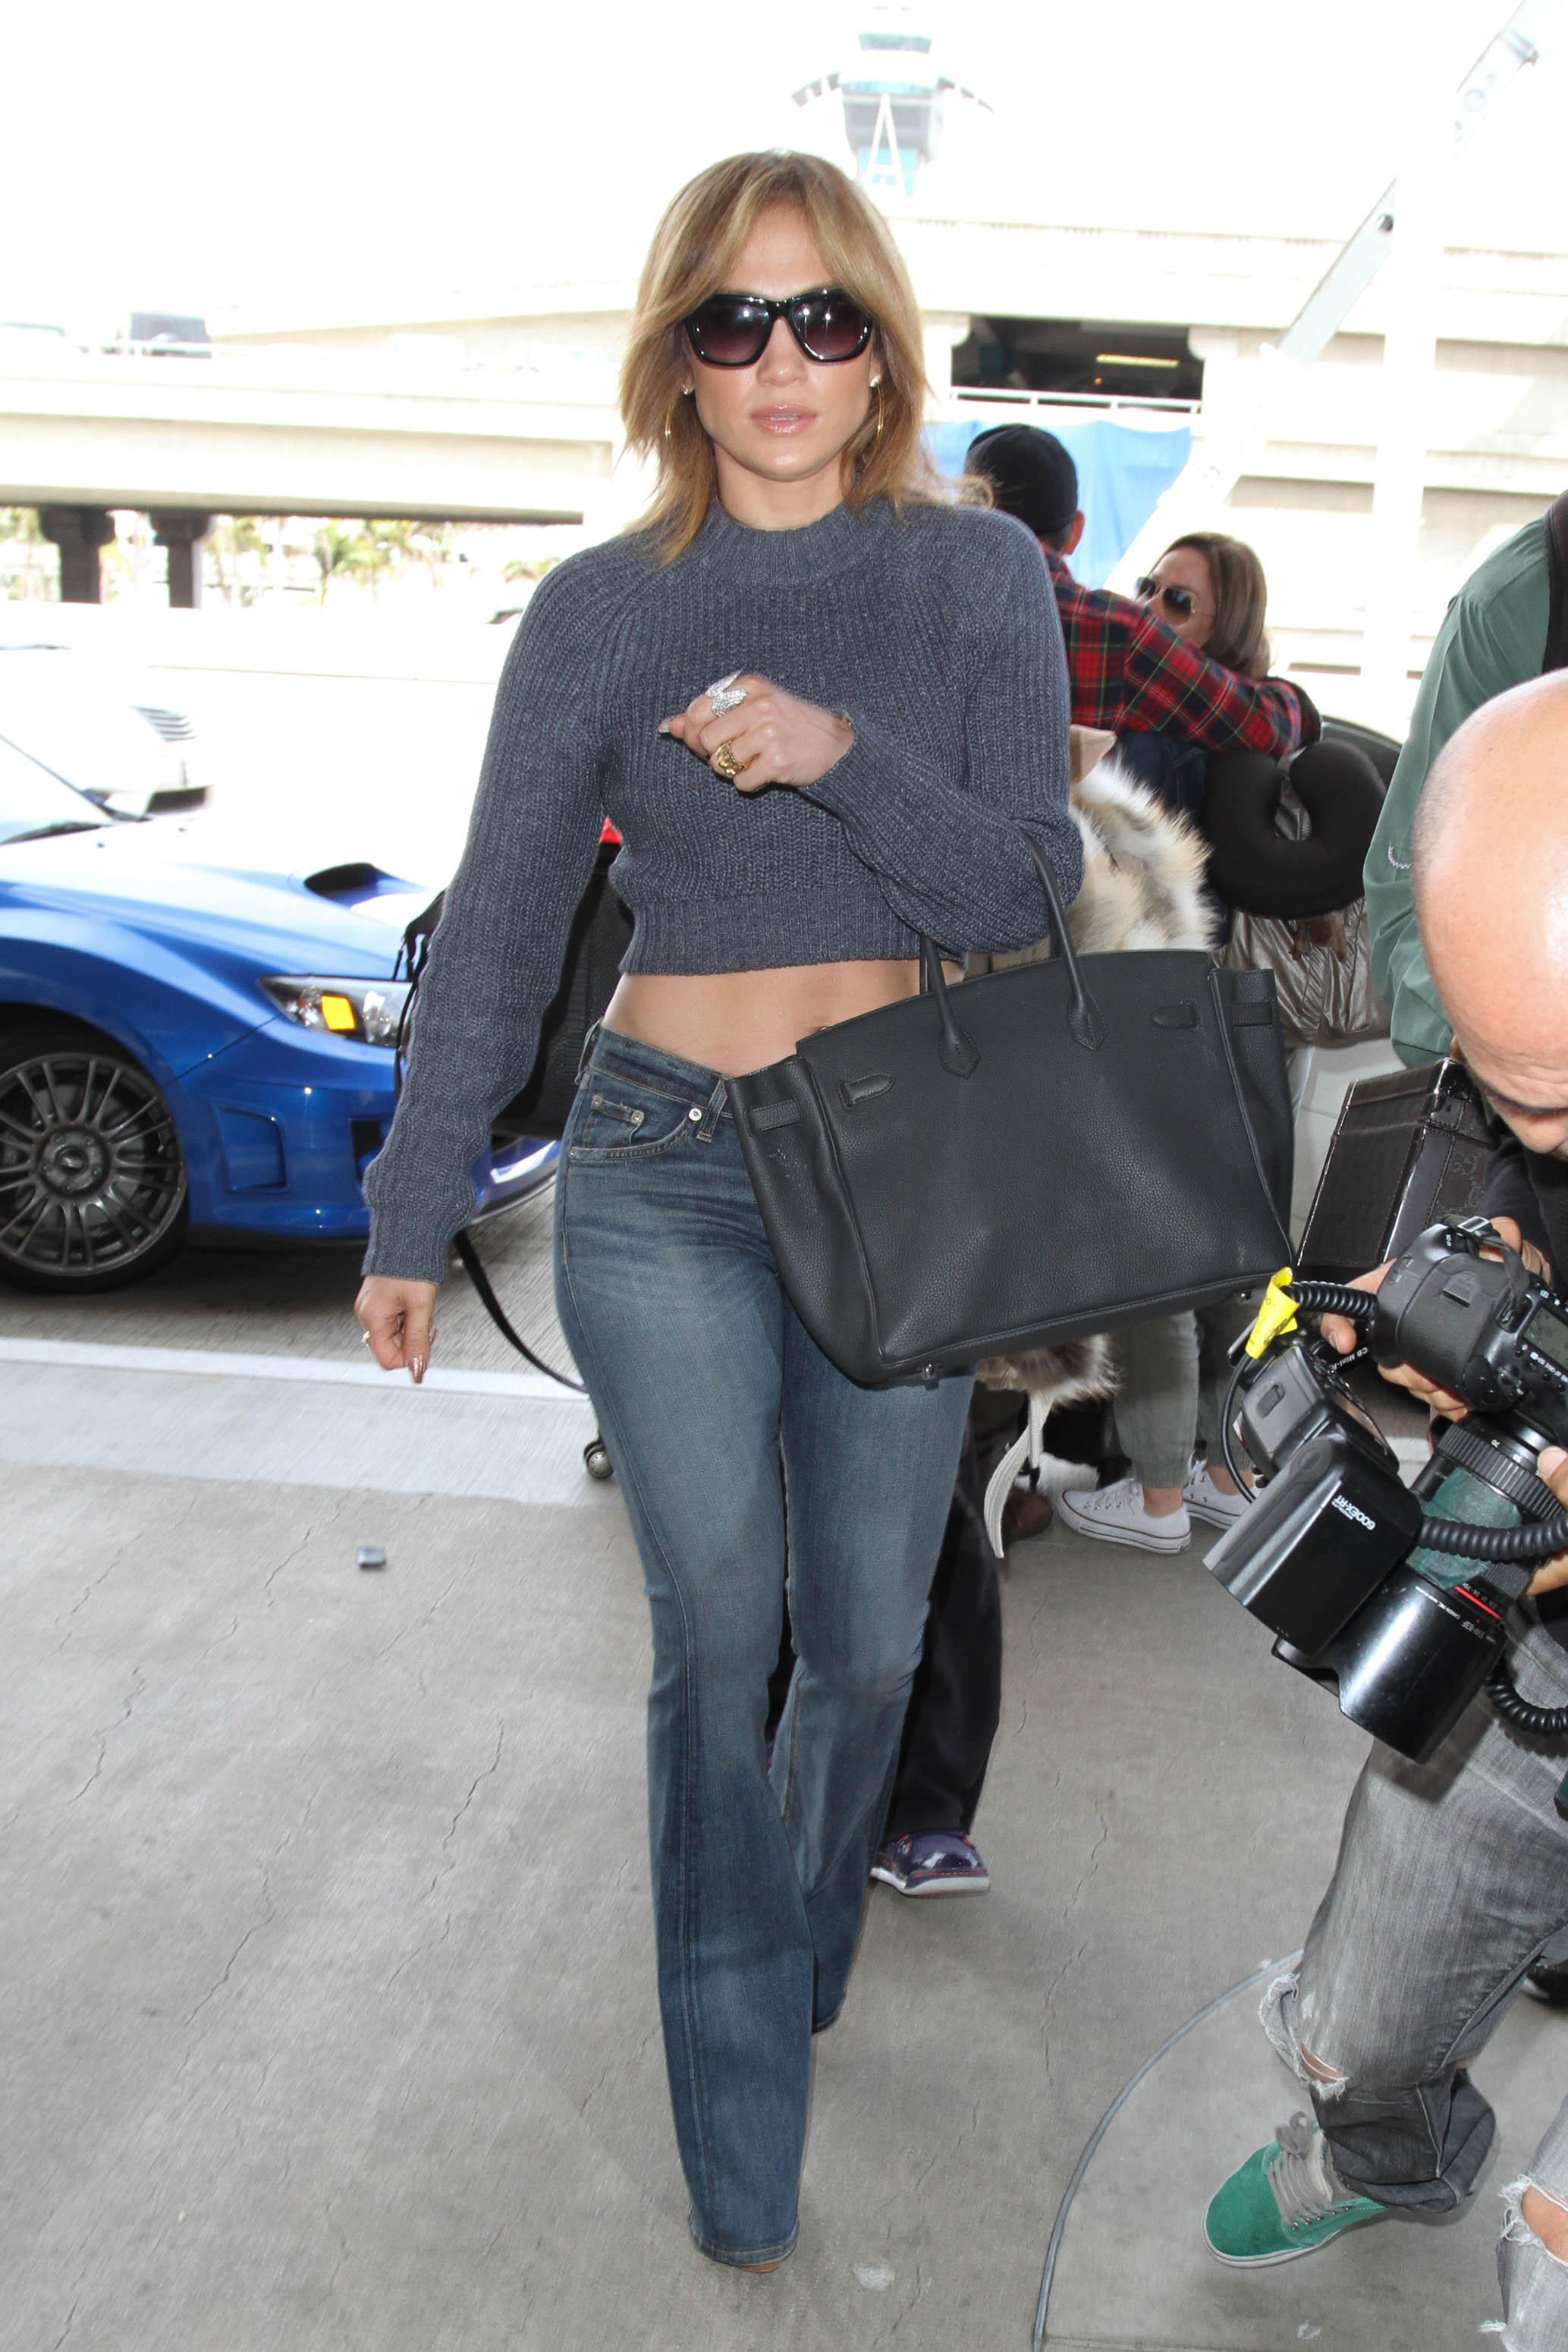 Bob-Frisur: Jennifer Lopez